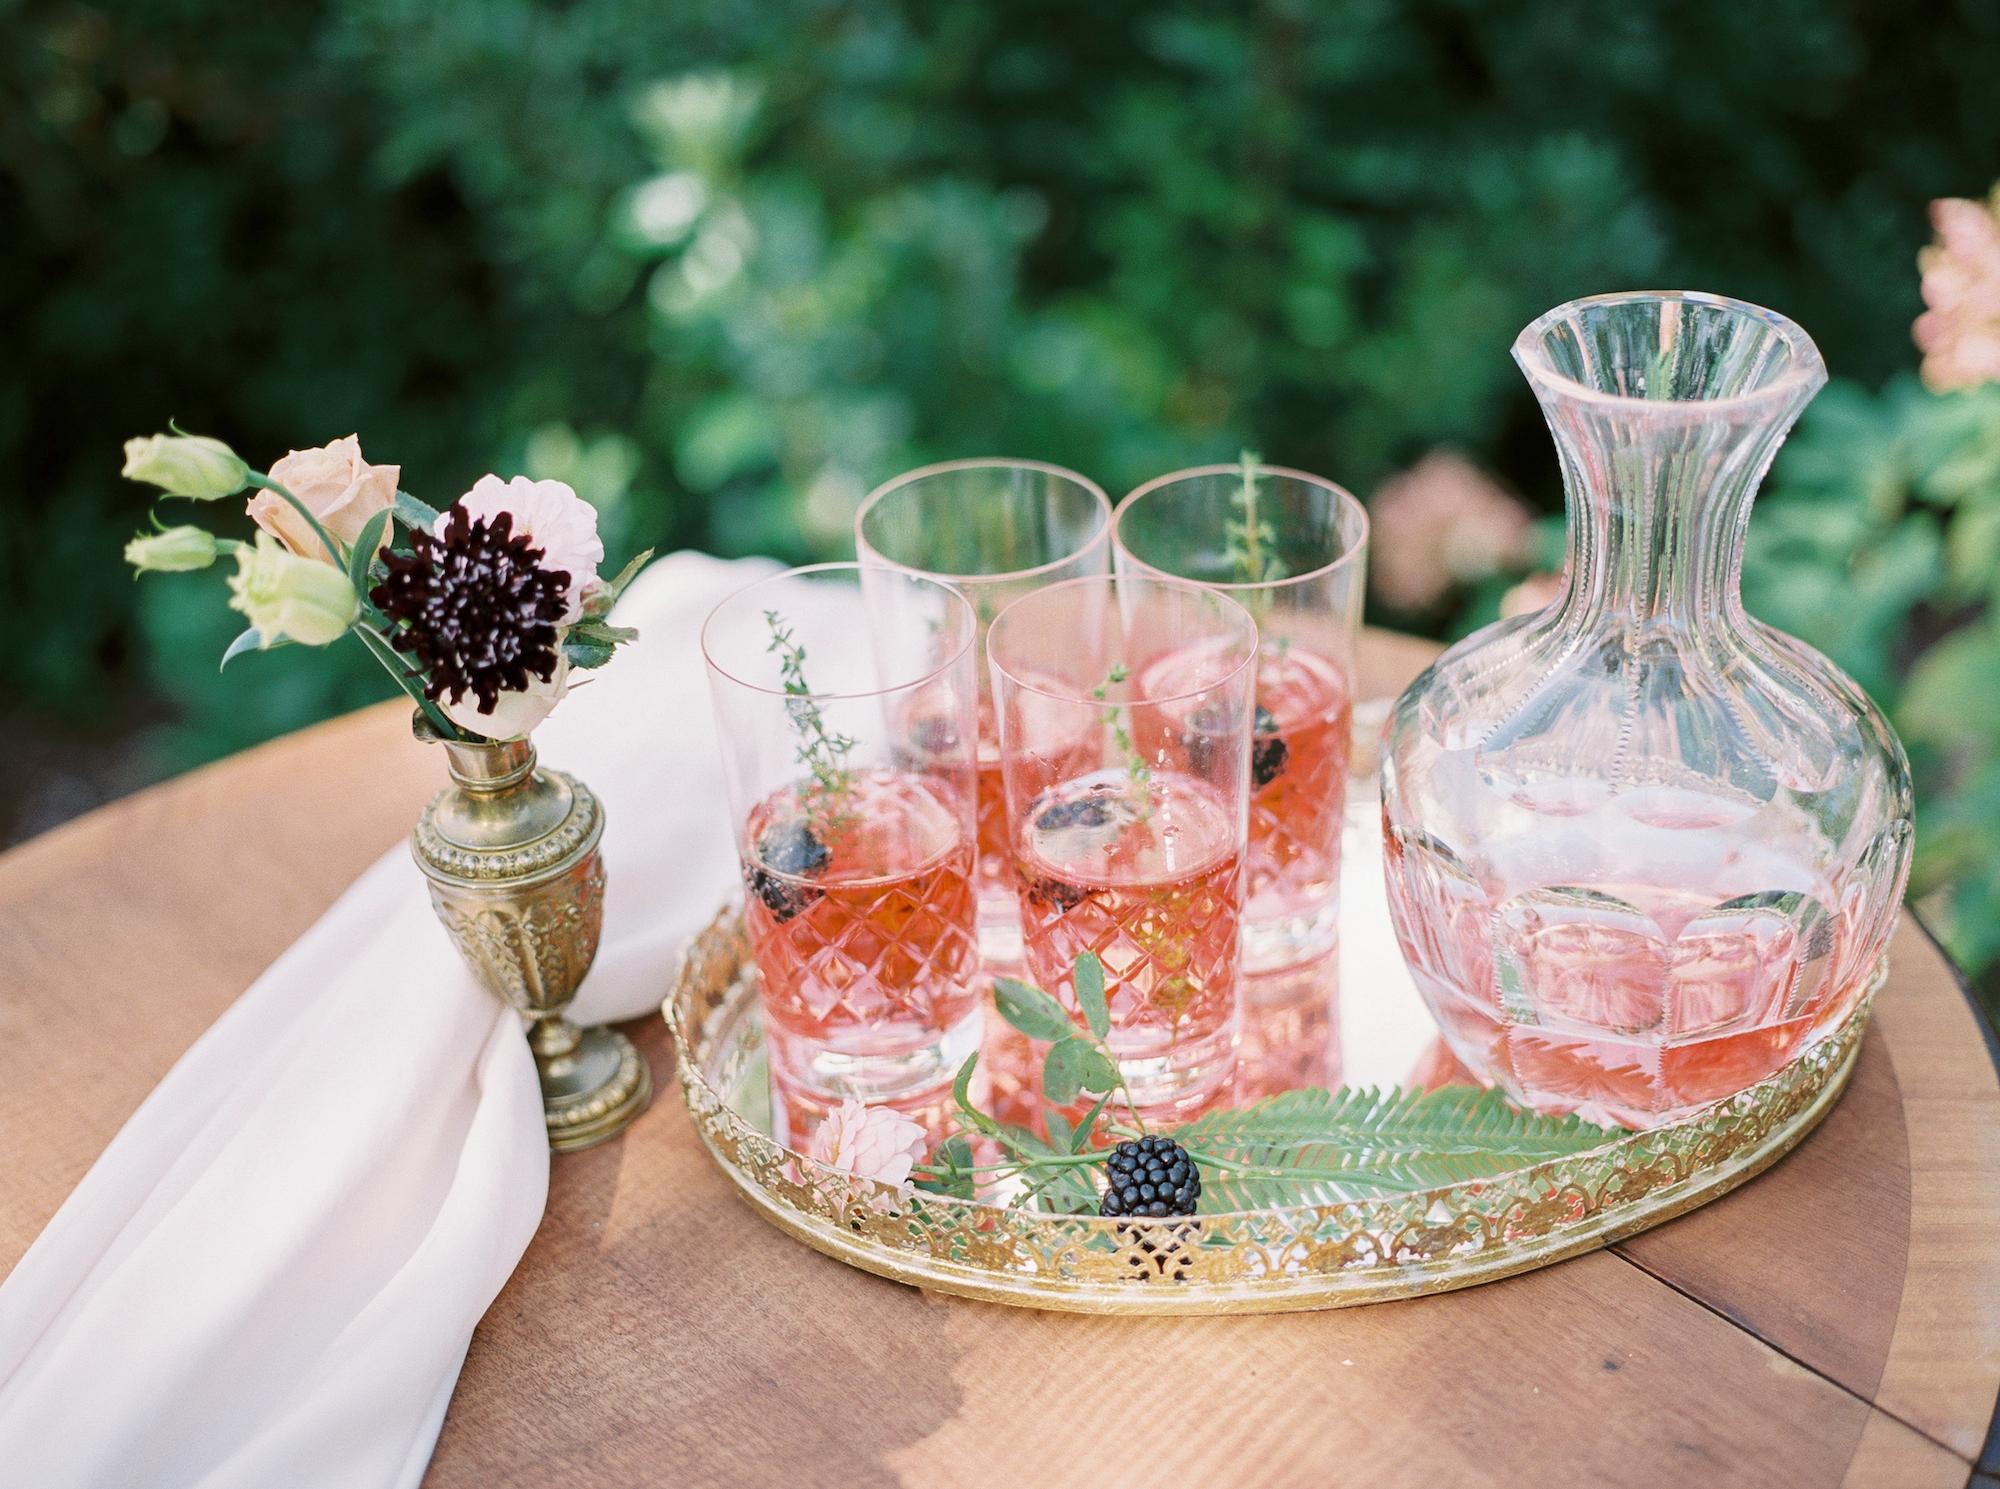 Boutique-DC-MD-VA-Event-Planner-Wedding-Designer-A-Griffin-Events-Fall-Elopement45.jpg